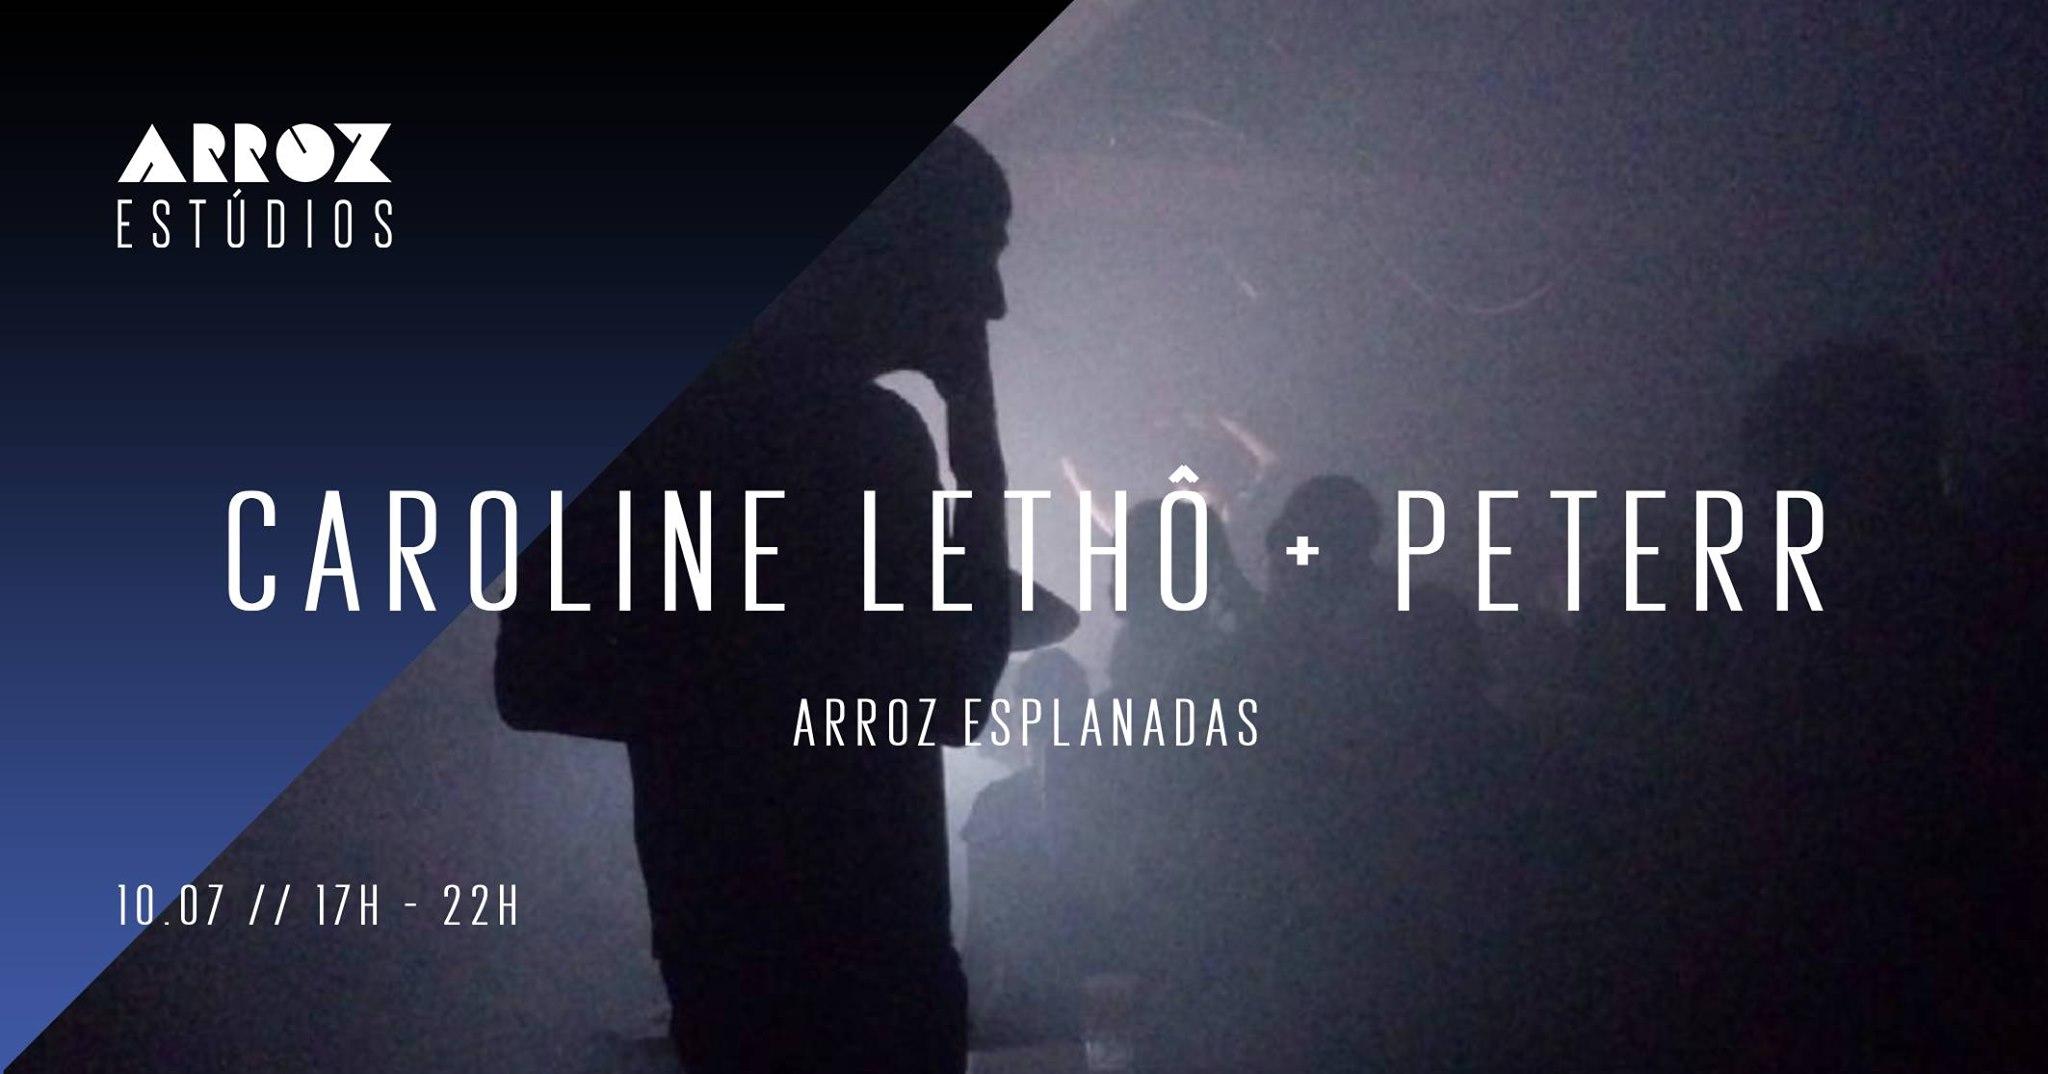 Caroline Lethô + Peterr - Arroz Esplanadas